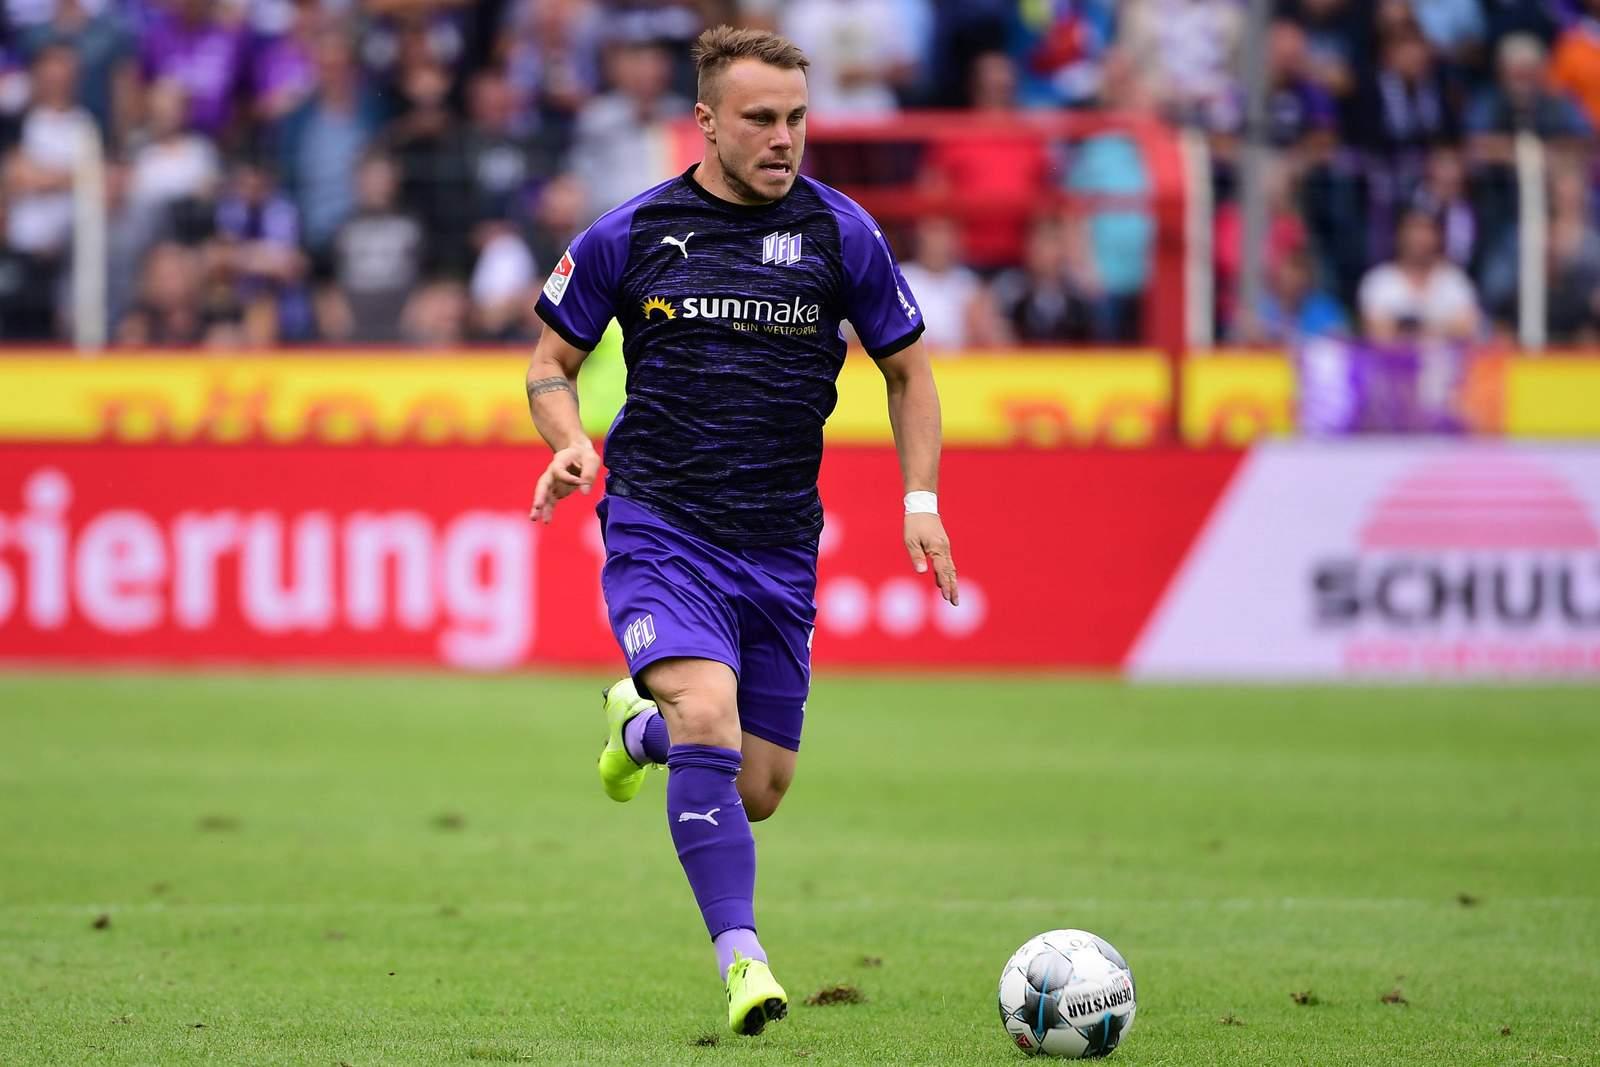 Nico Granatowski vom VfL osnabrück